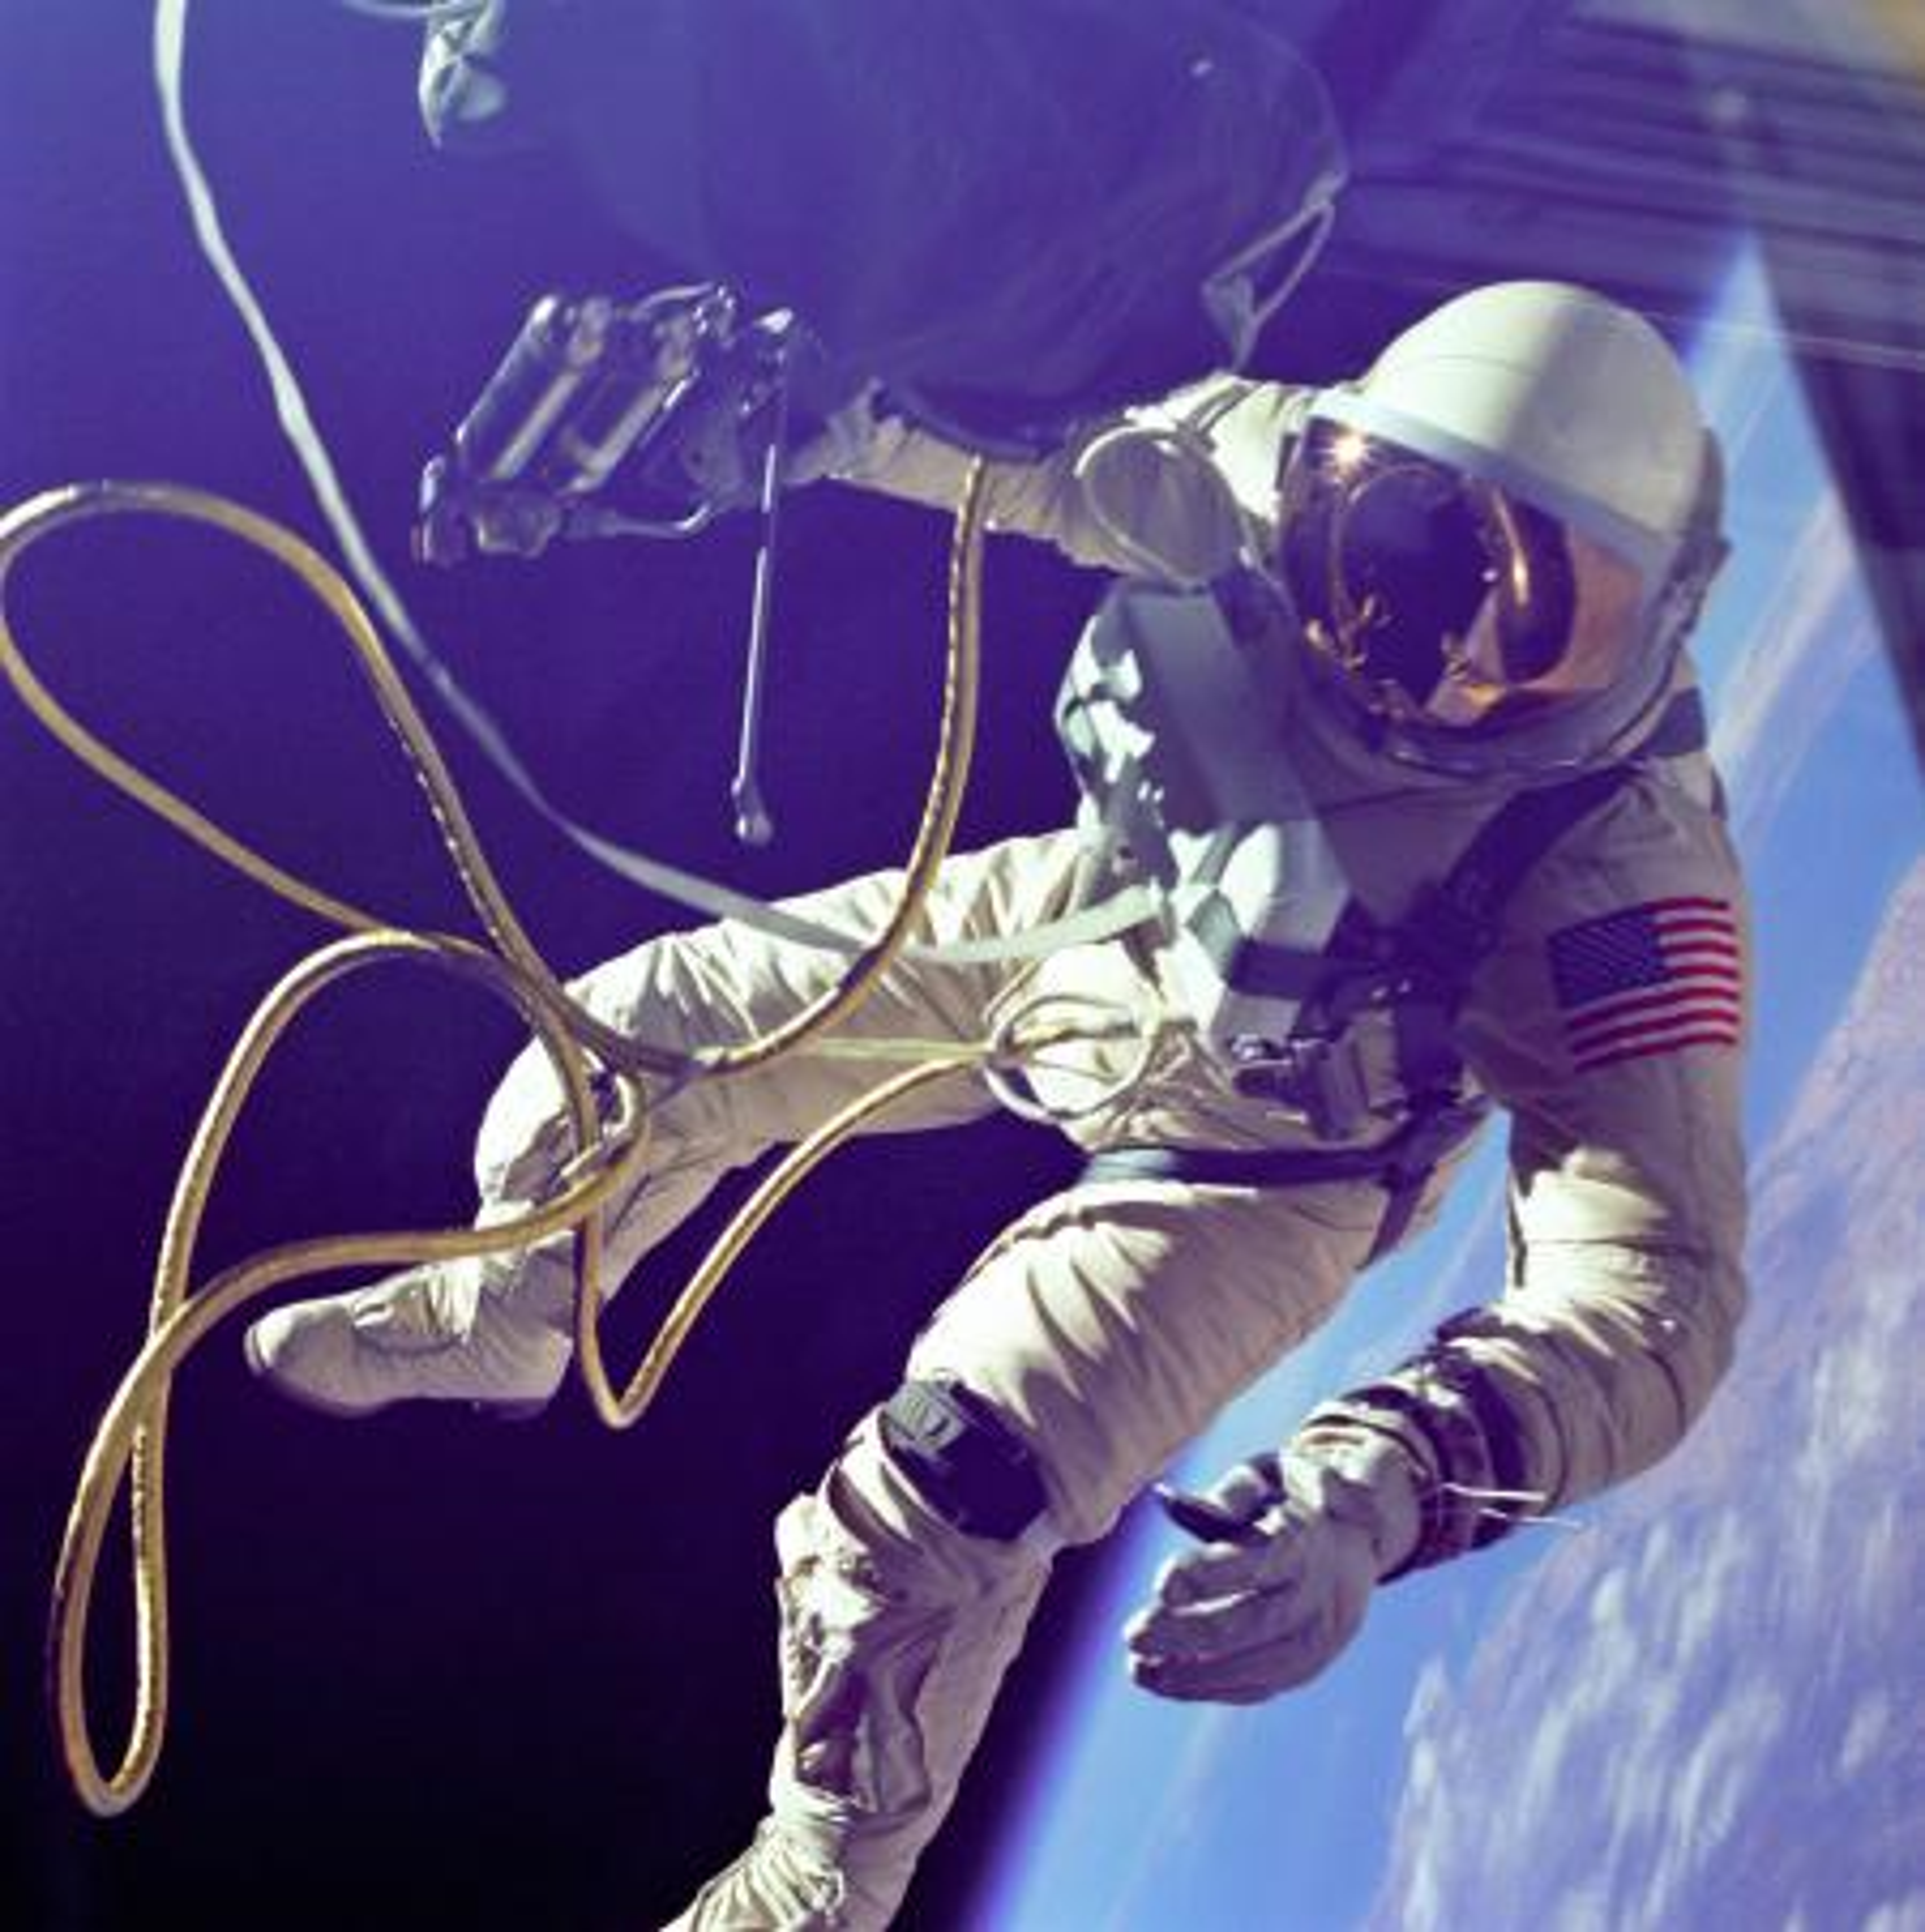 Gemini spacewalk - astronaut Ed White